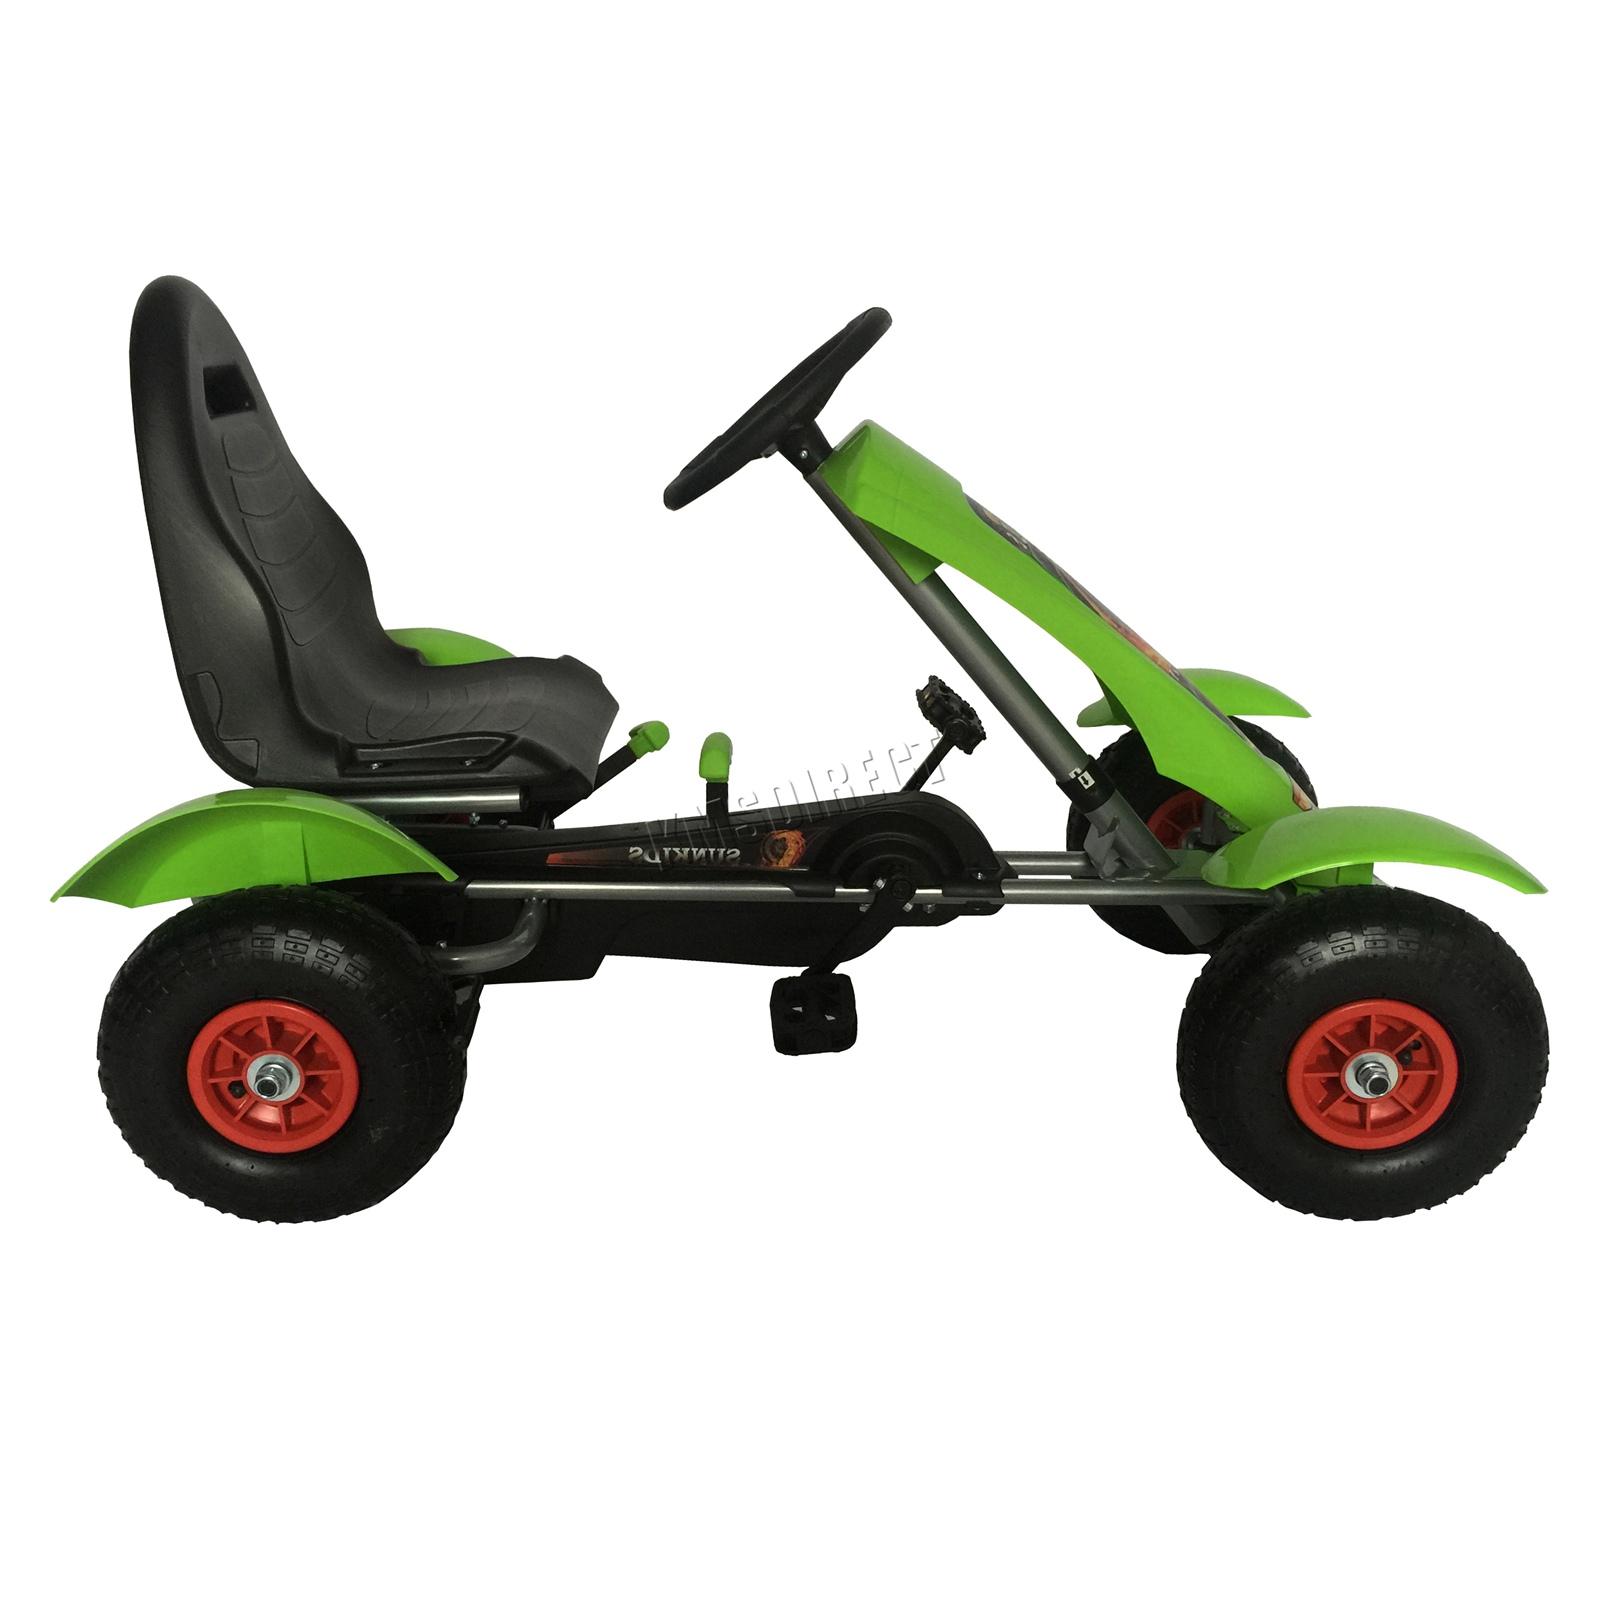 201701719267 2475 I 276 27 GOKART FH G03 GREEN KMSWM044 - Foxhunter Infantil Go Kart – Pedal Coche para Niños Gocart con Freno de Mano G03